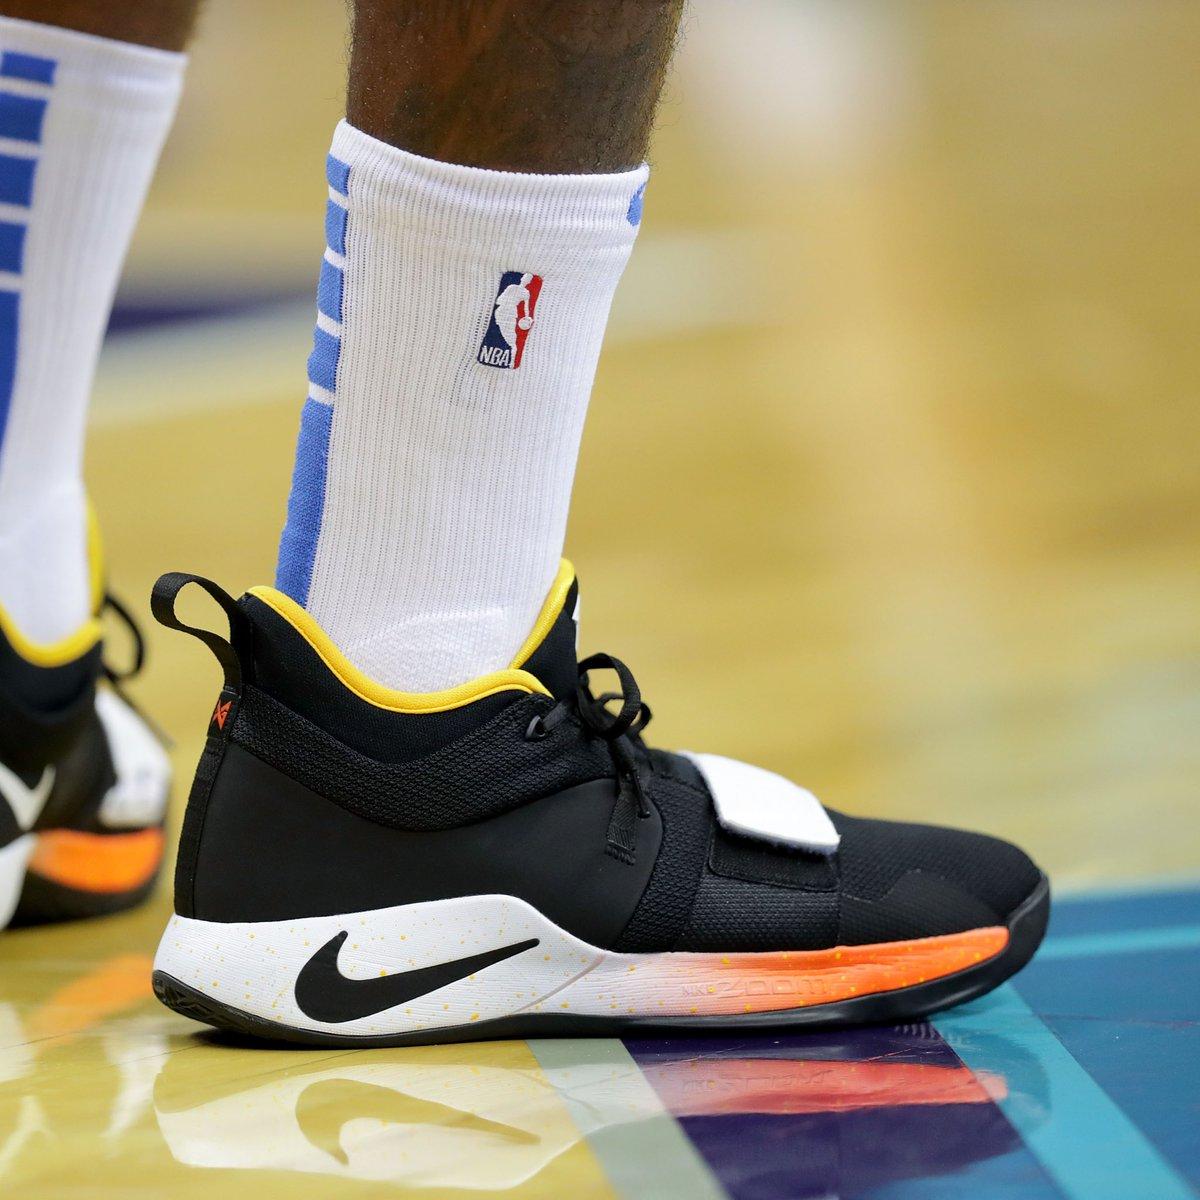 Yg_Trece wearing a new Nike PG 2.5